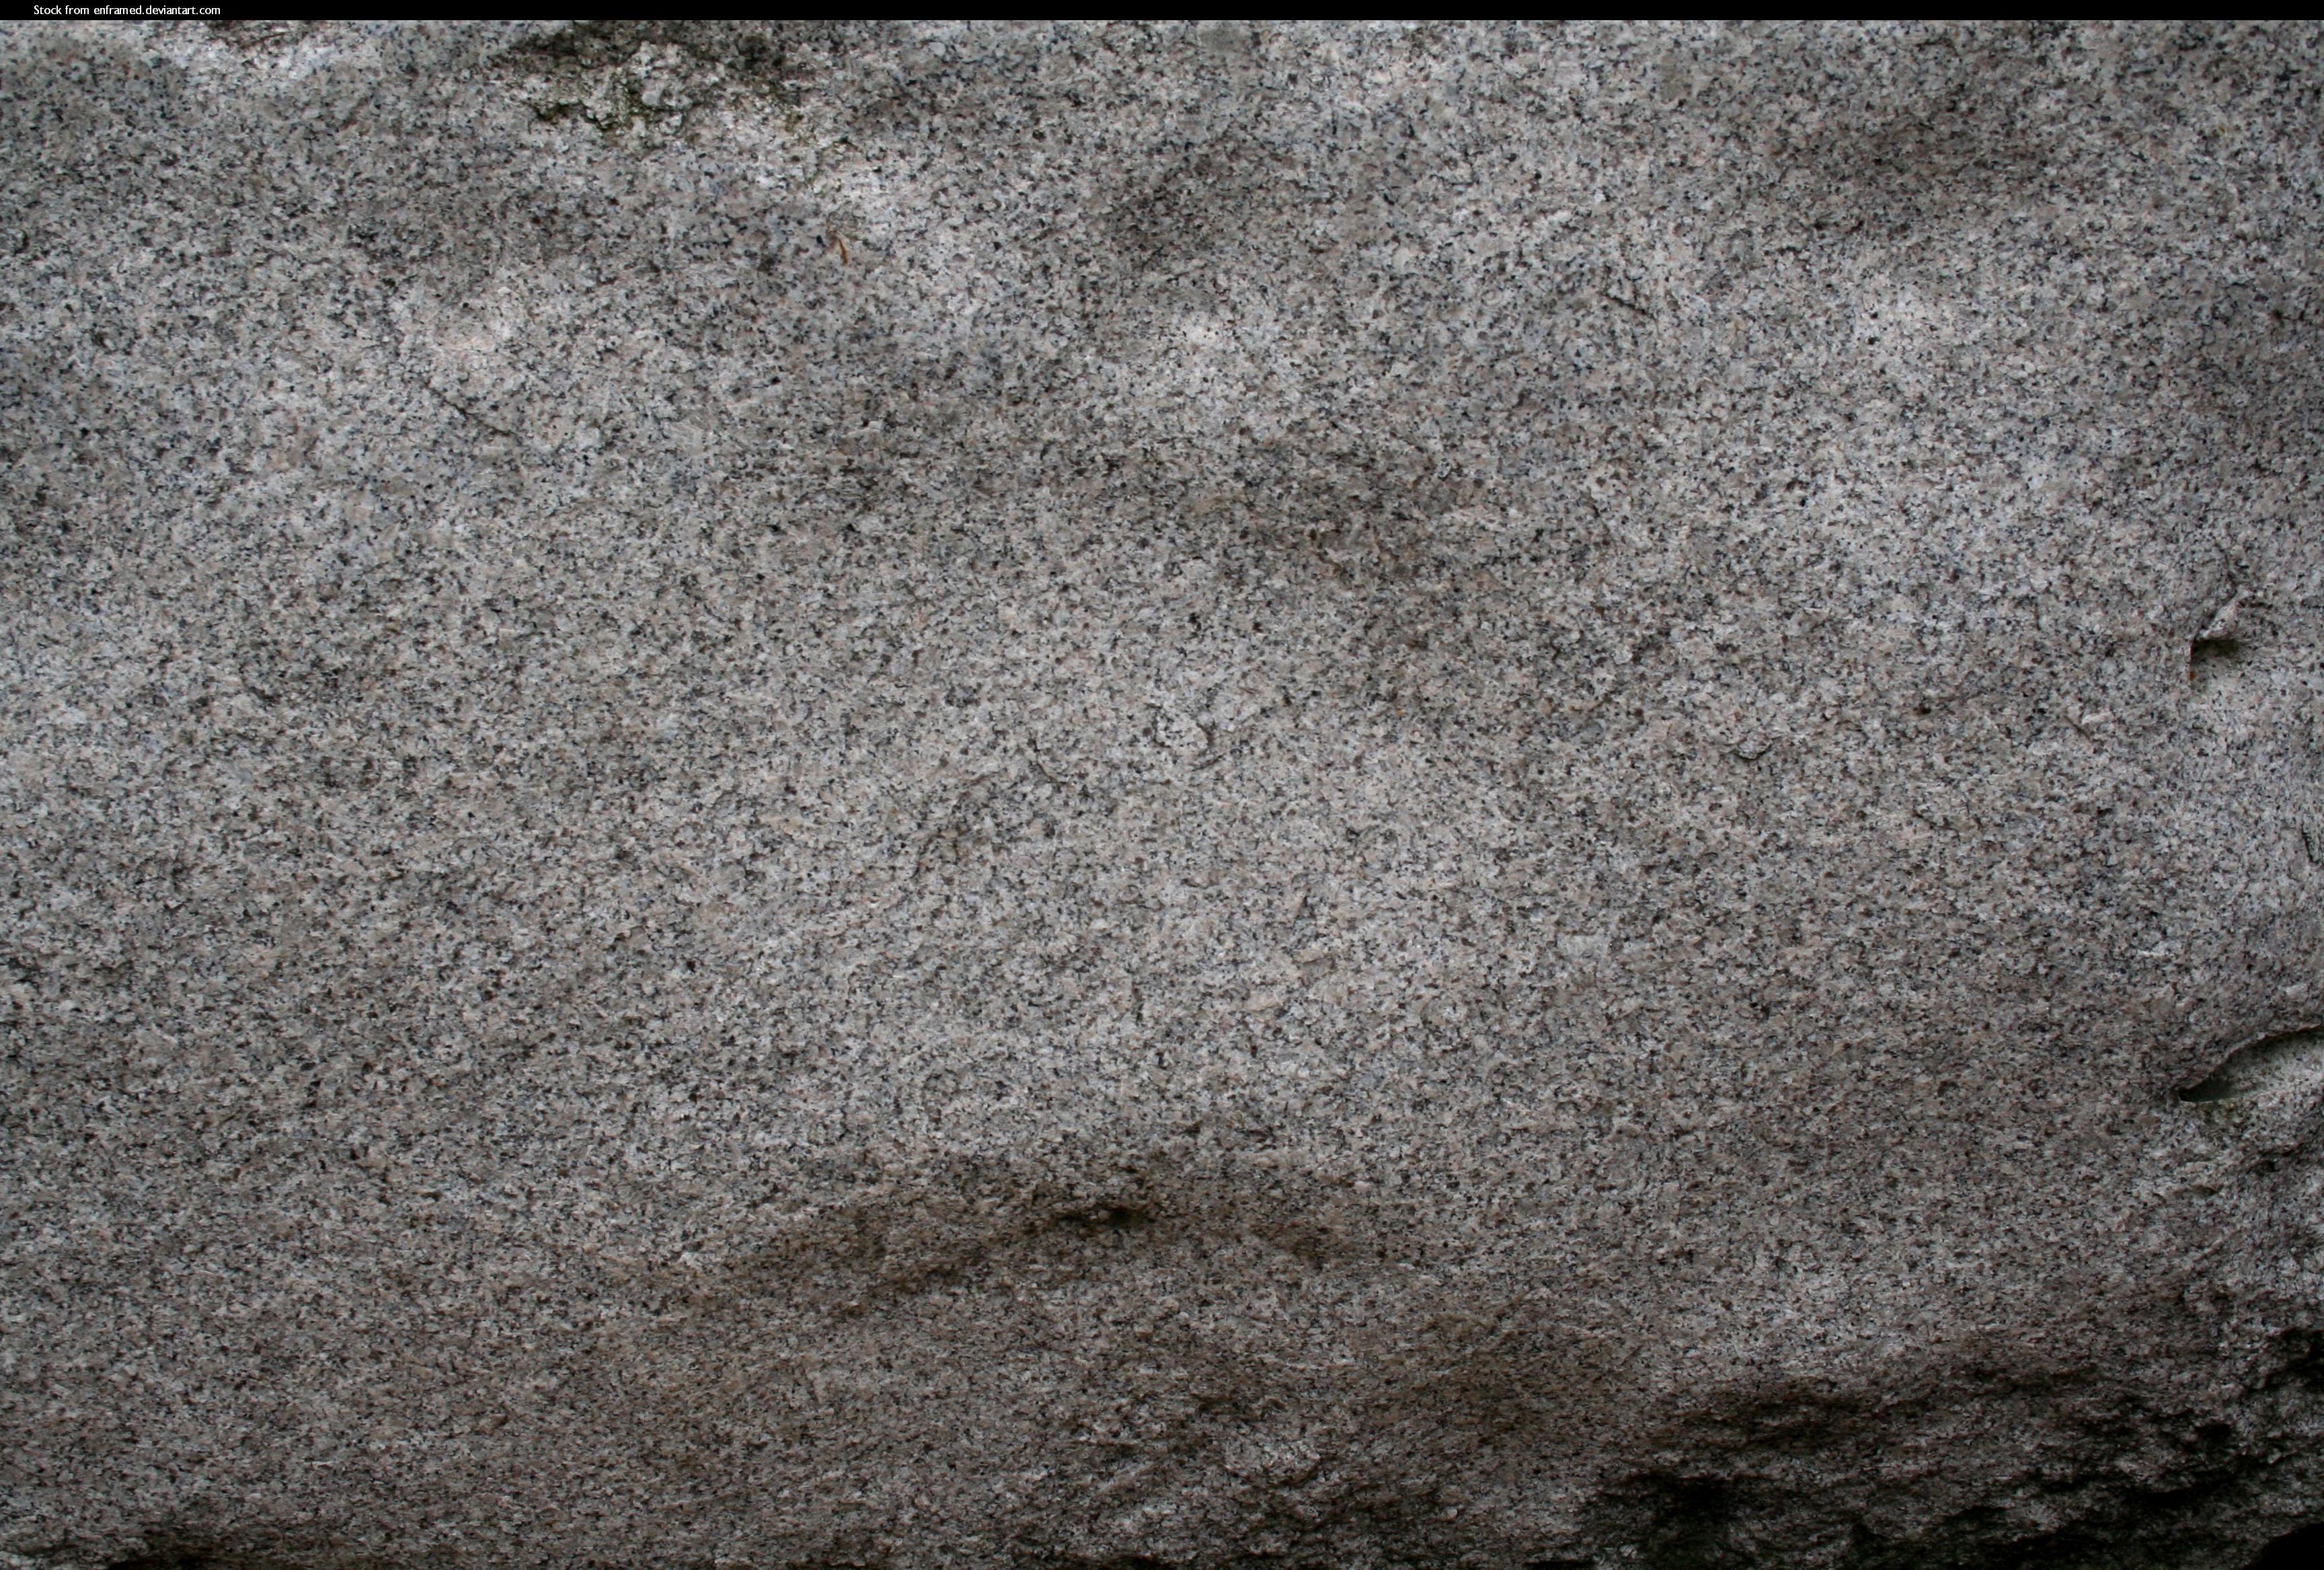 Granite Stone Texture : Stone granite texture by enframed on deviantart